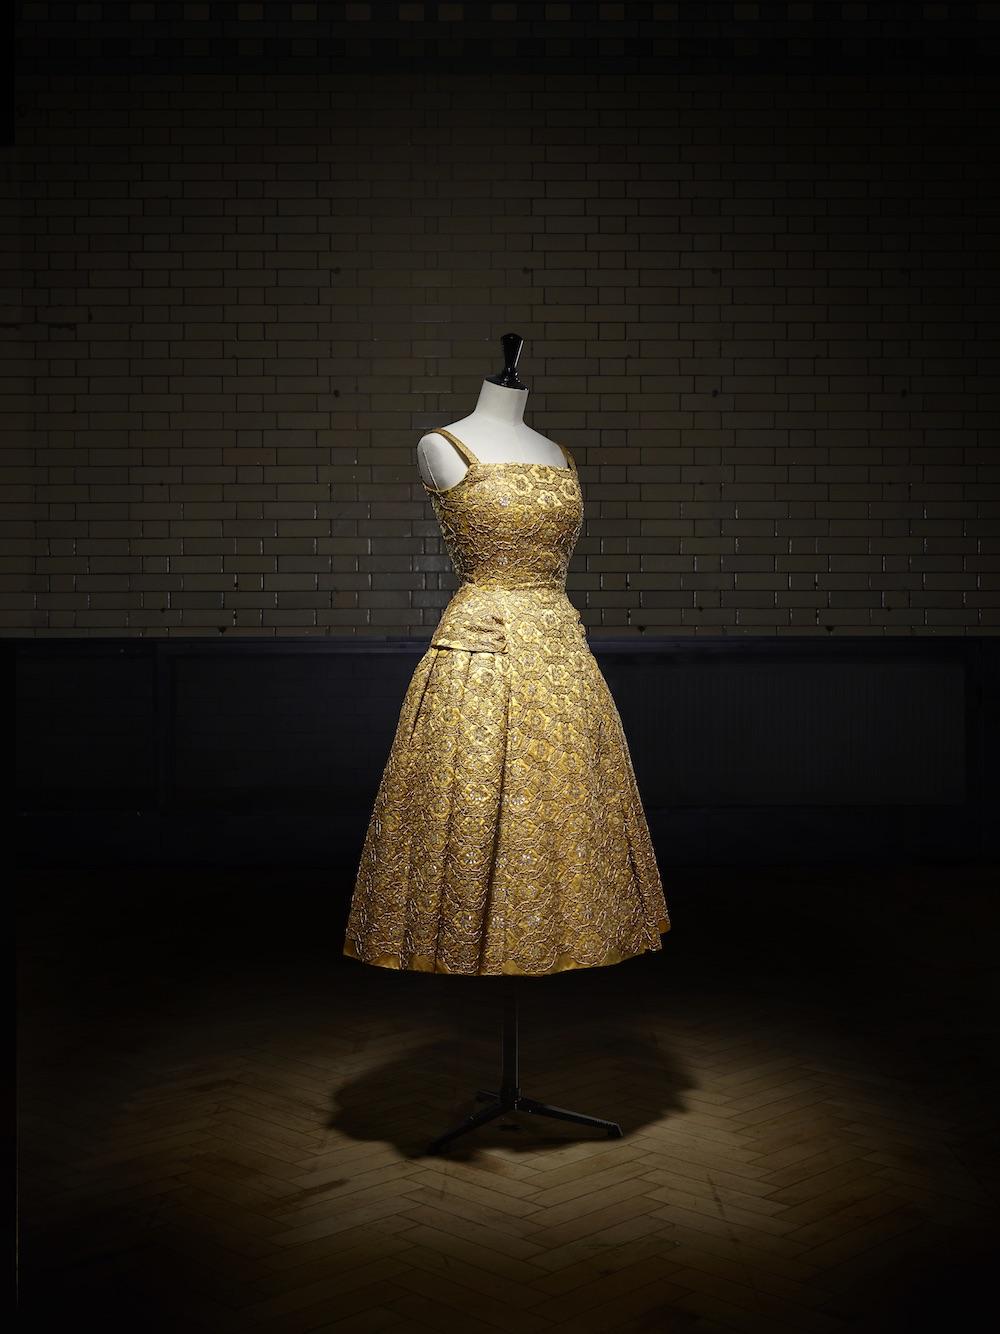 Pérou short evening dress, Autumn-Winter 1954 Haute Couture collection, H line. Victoria and Albert Museum, London. Gift of Cecil Beaton. Photo © Laziz Hamani